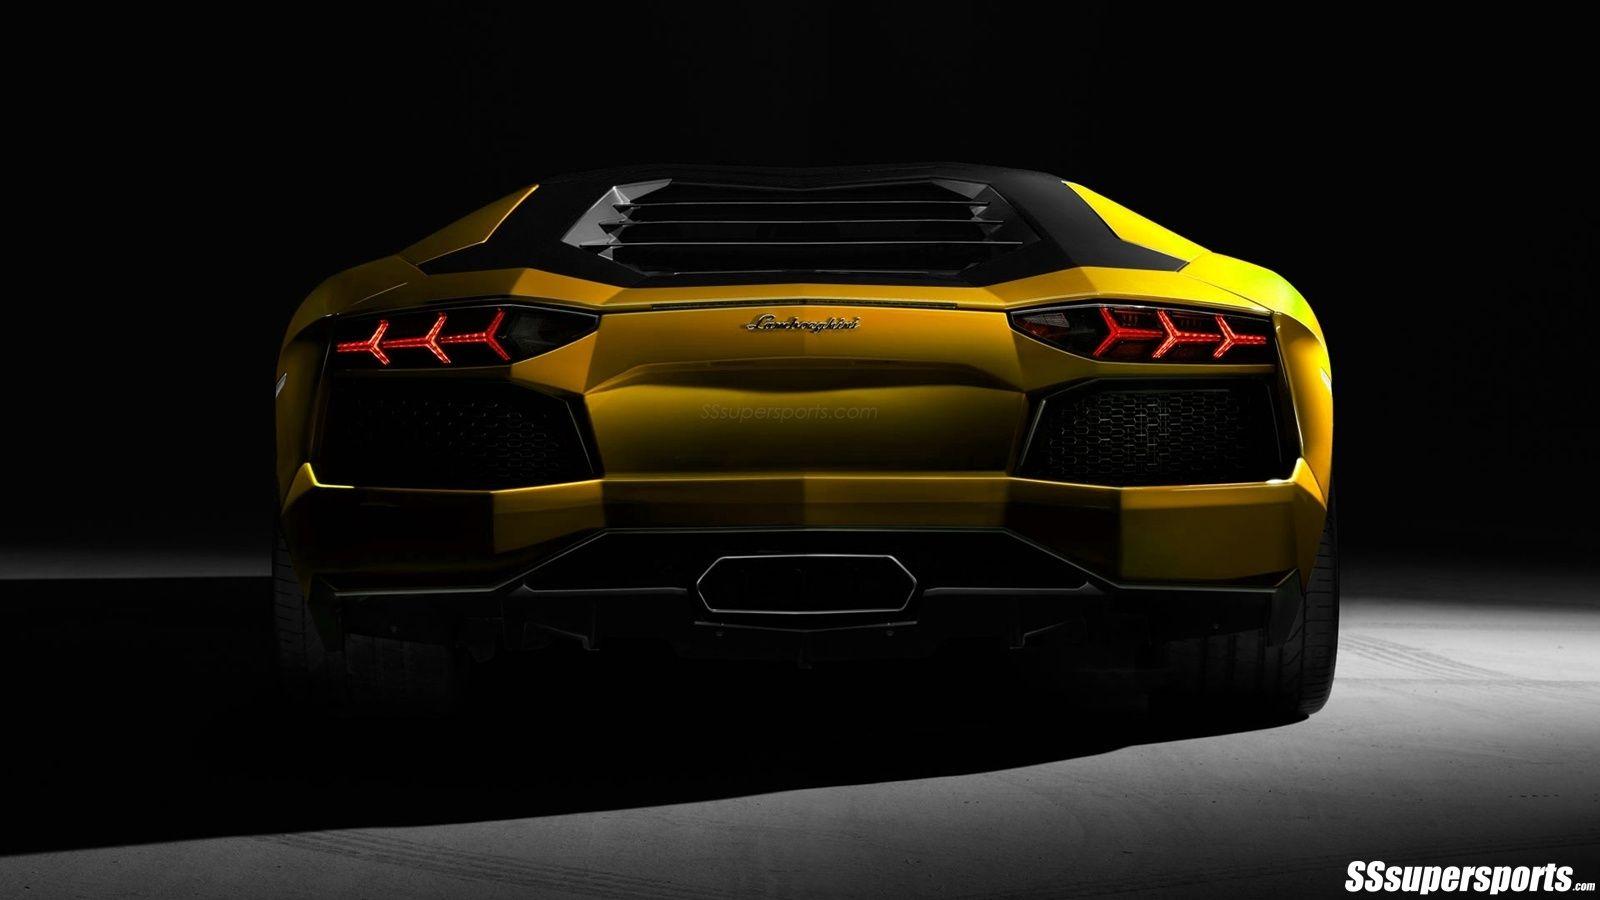 Yellow And Black Lamborghini Aventador Pic 4 Gallery Lamborghini Aventador Lamborghini Lamborghini Aventador Wallpaper